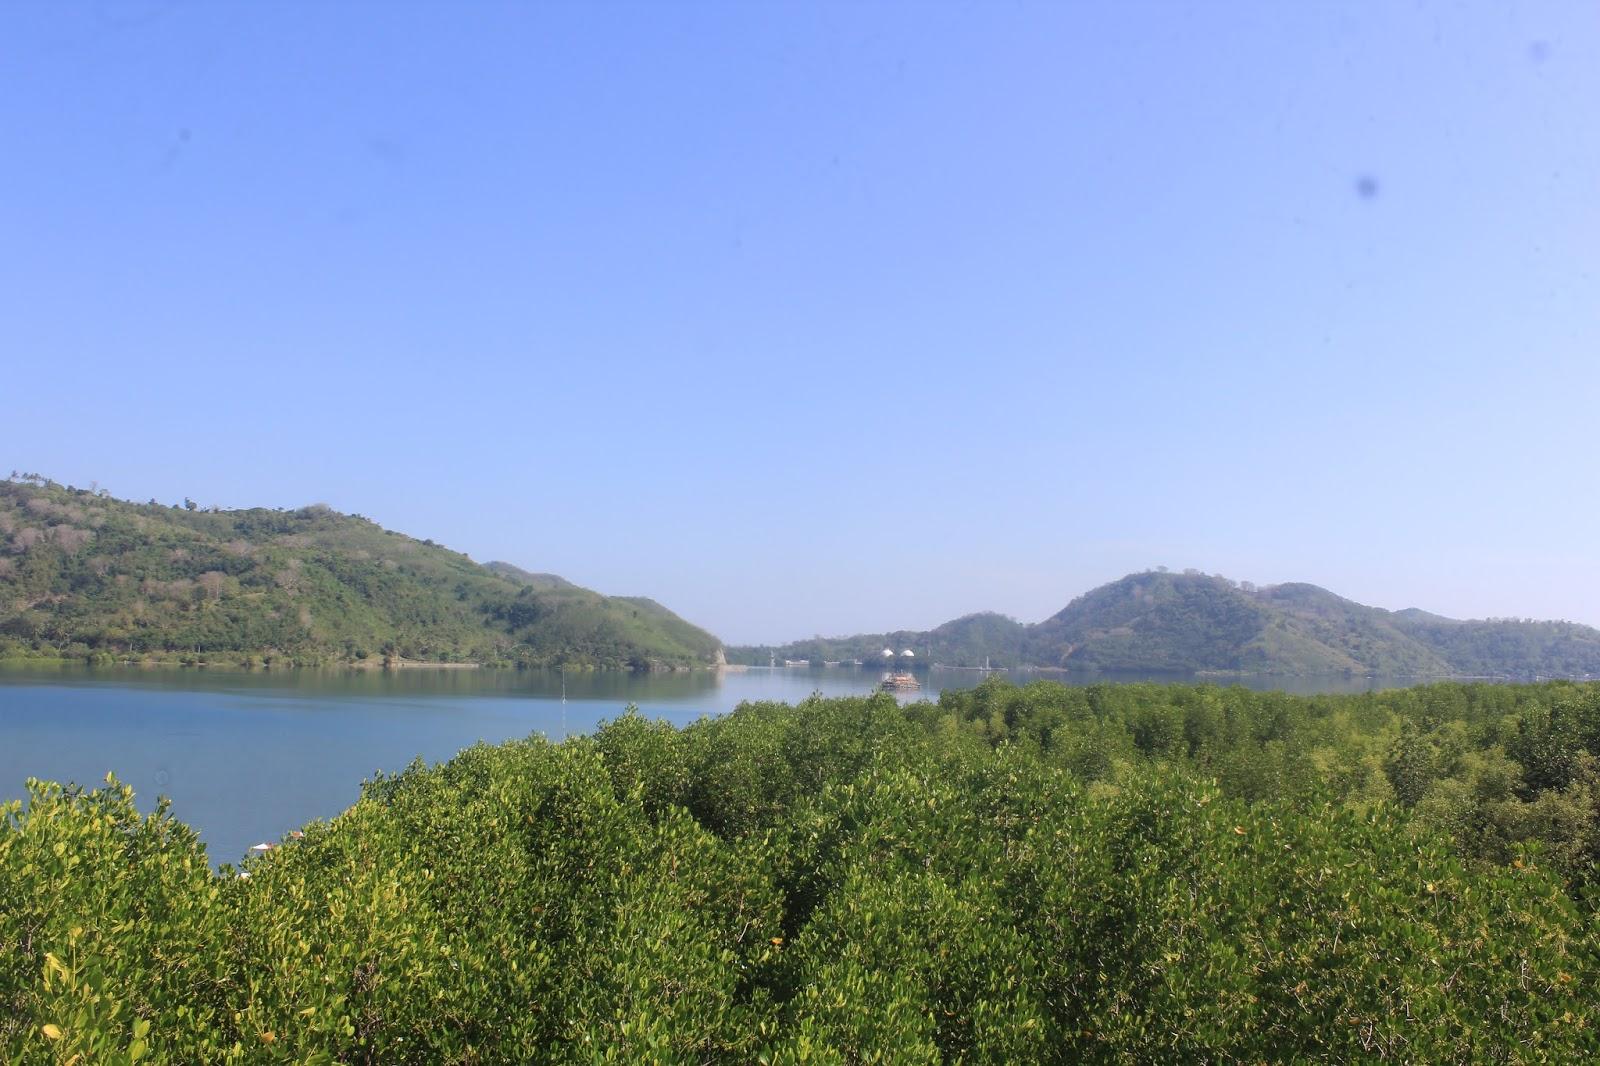 Pemandangan di pagi hari dari Puncak menara mangrove sekotong tengah